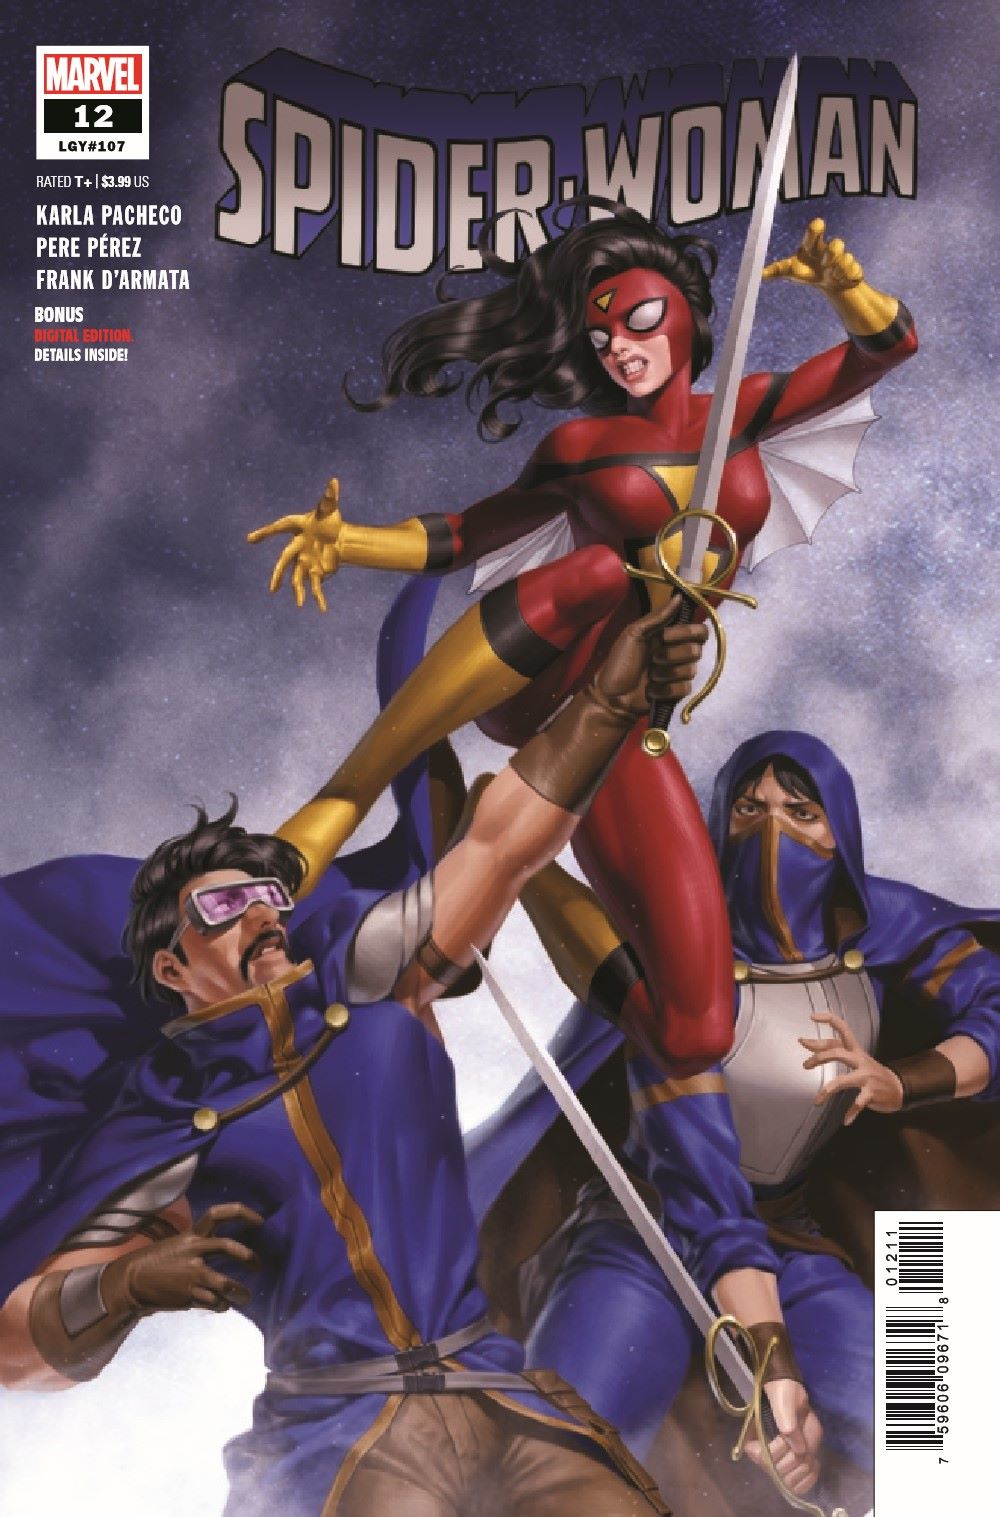 SWOMAN2020012_Preview-1 ComicList Previews: SPIDER-WOMAN #12